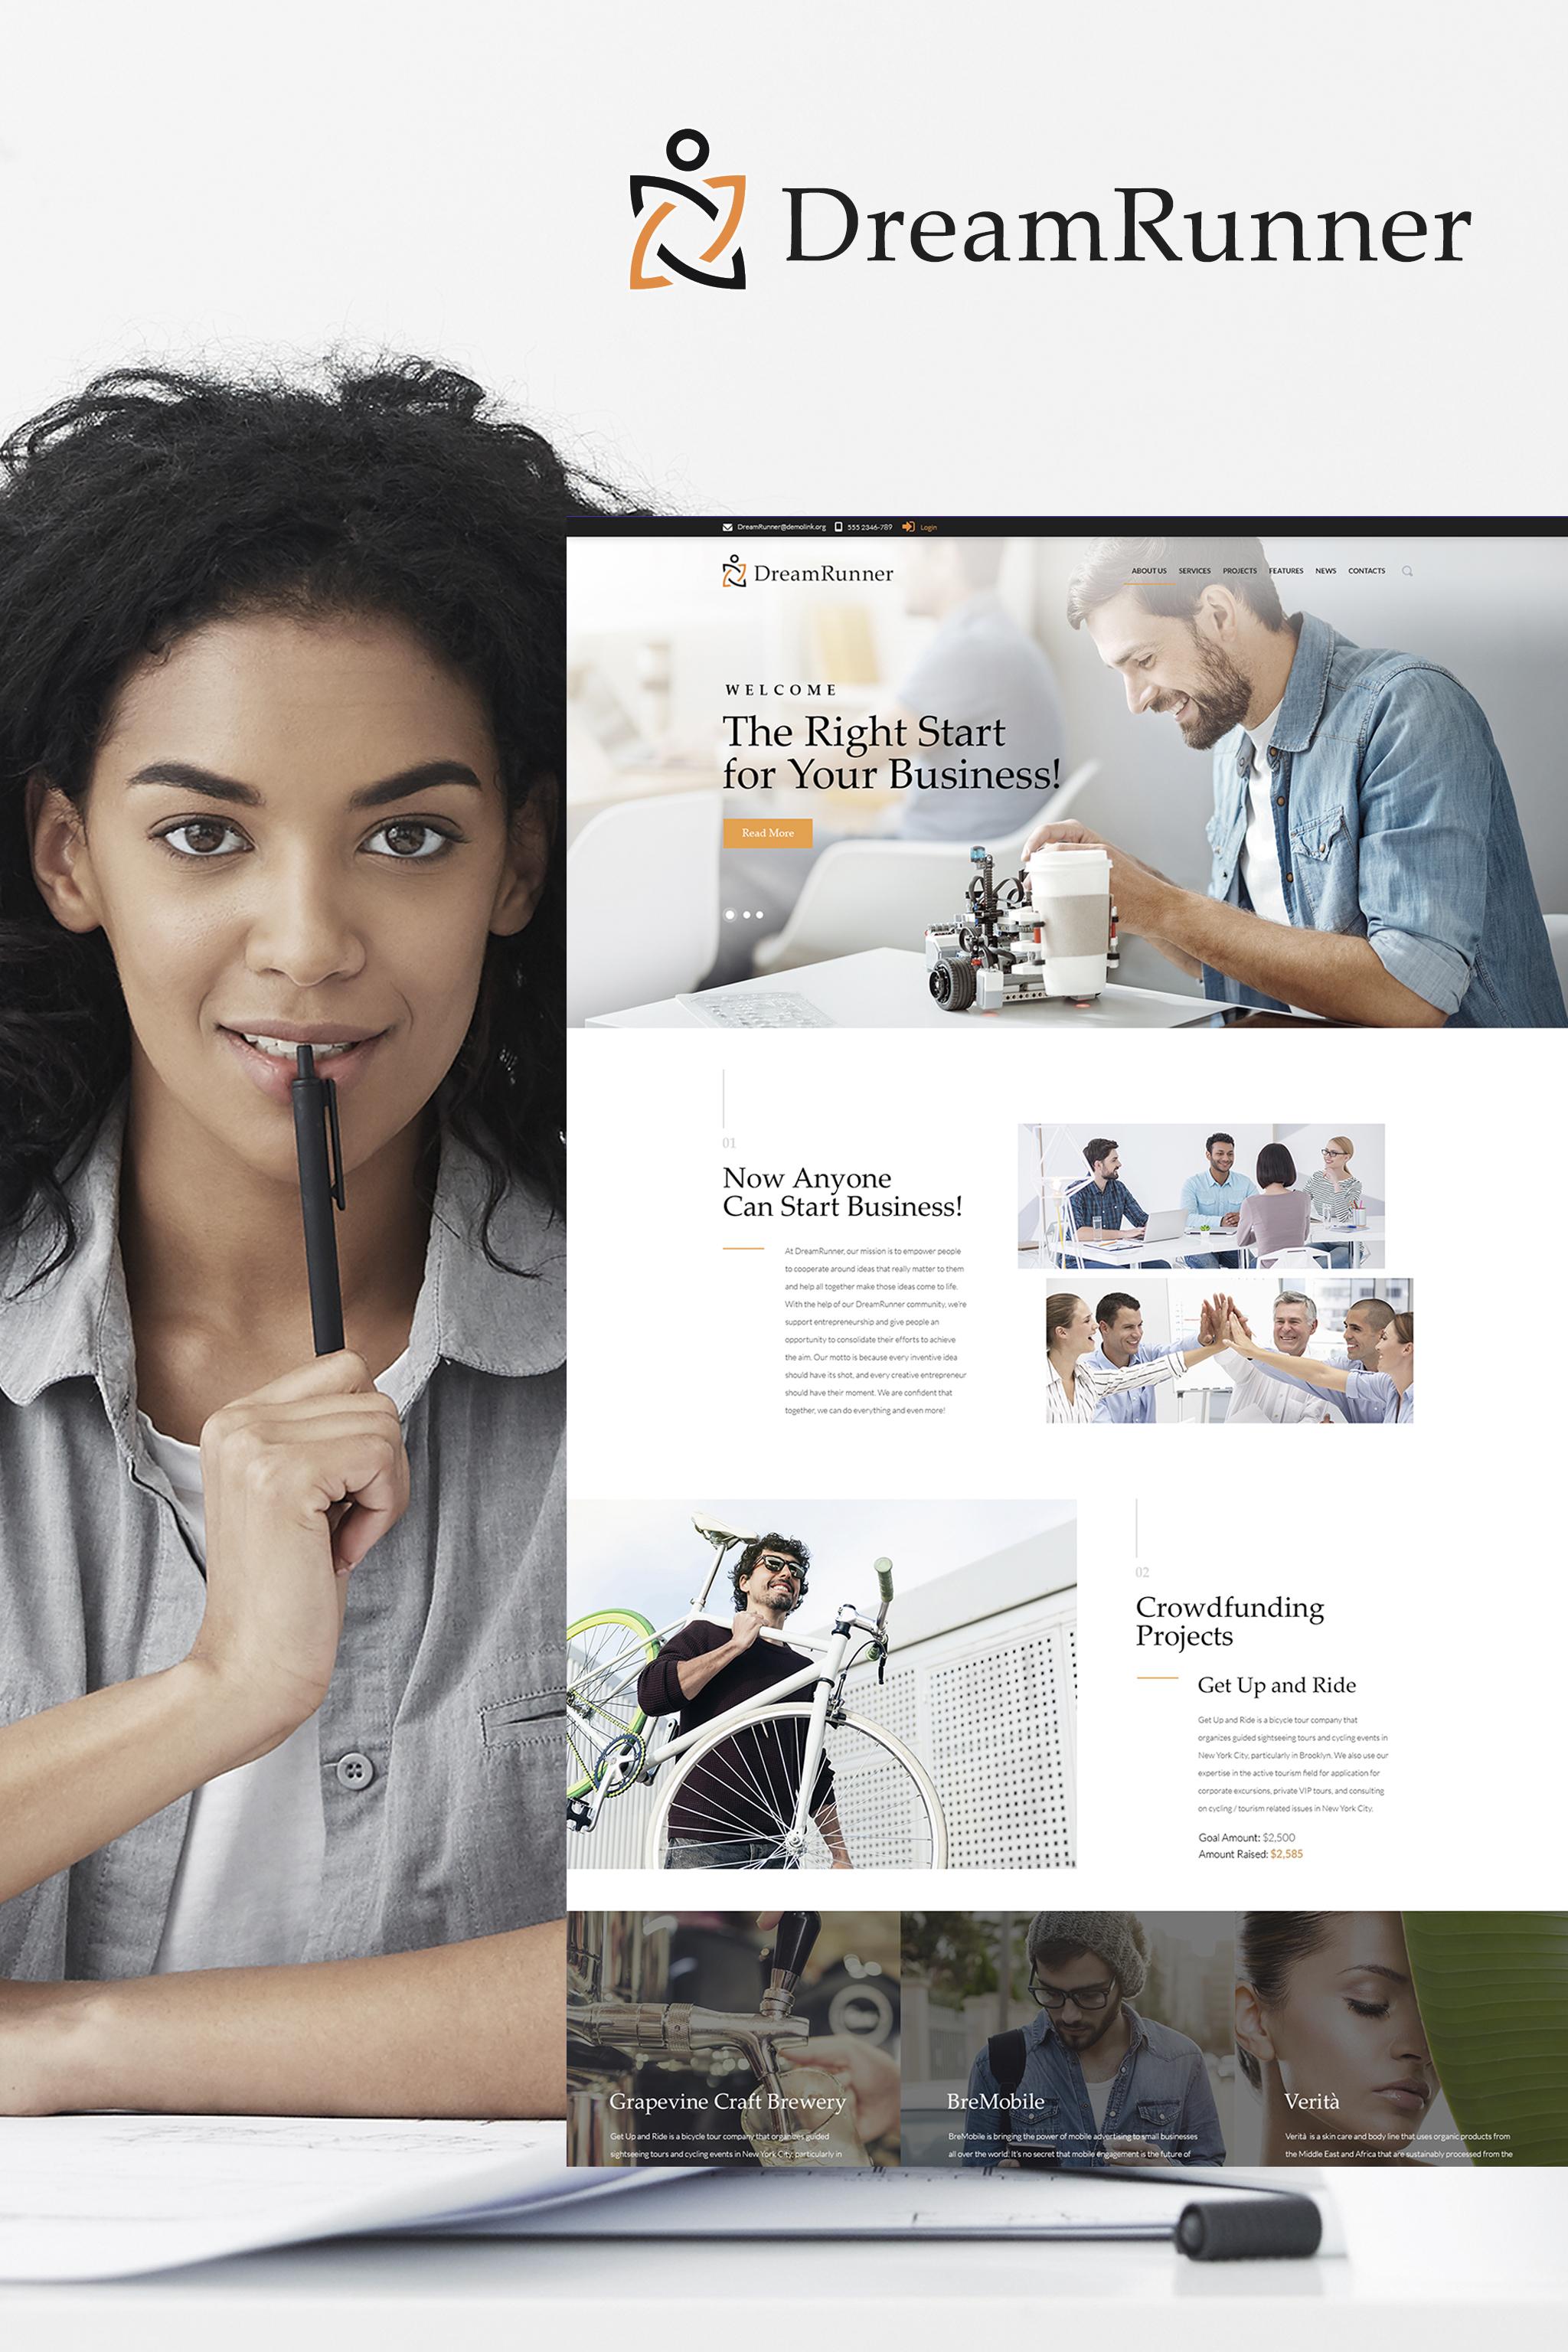 DreamRunner - Startup Bureau Responsive WordPress Template Tema WordPress №64994